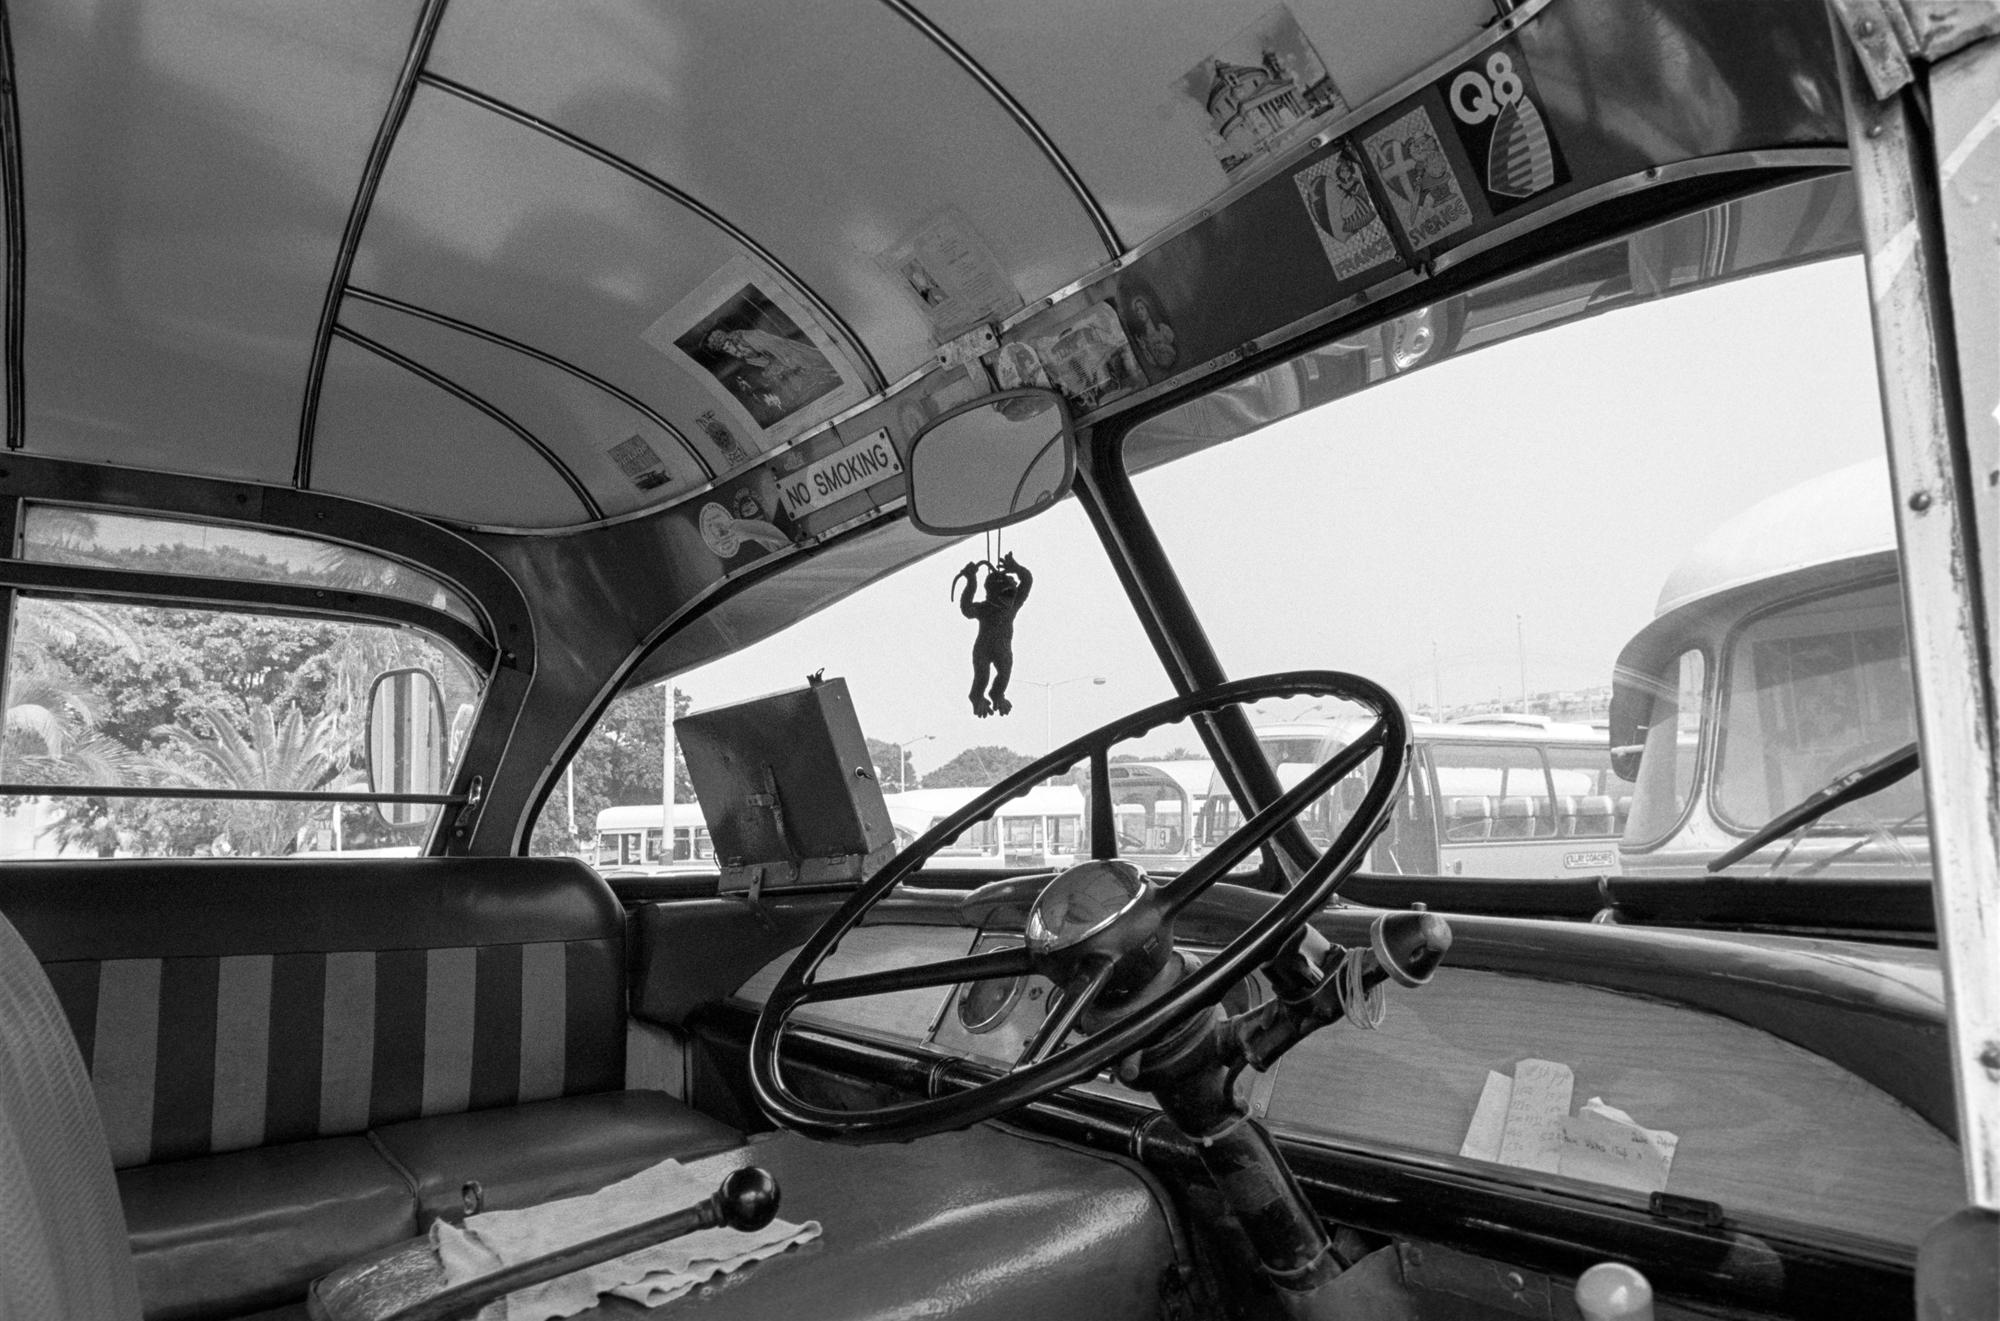 gorilla bus.jpg